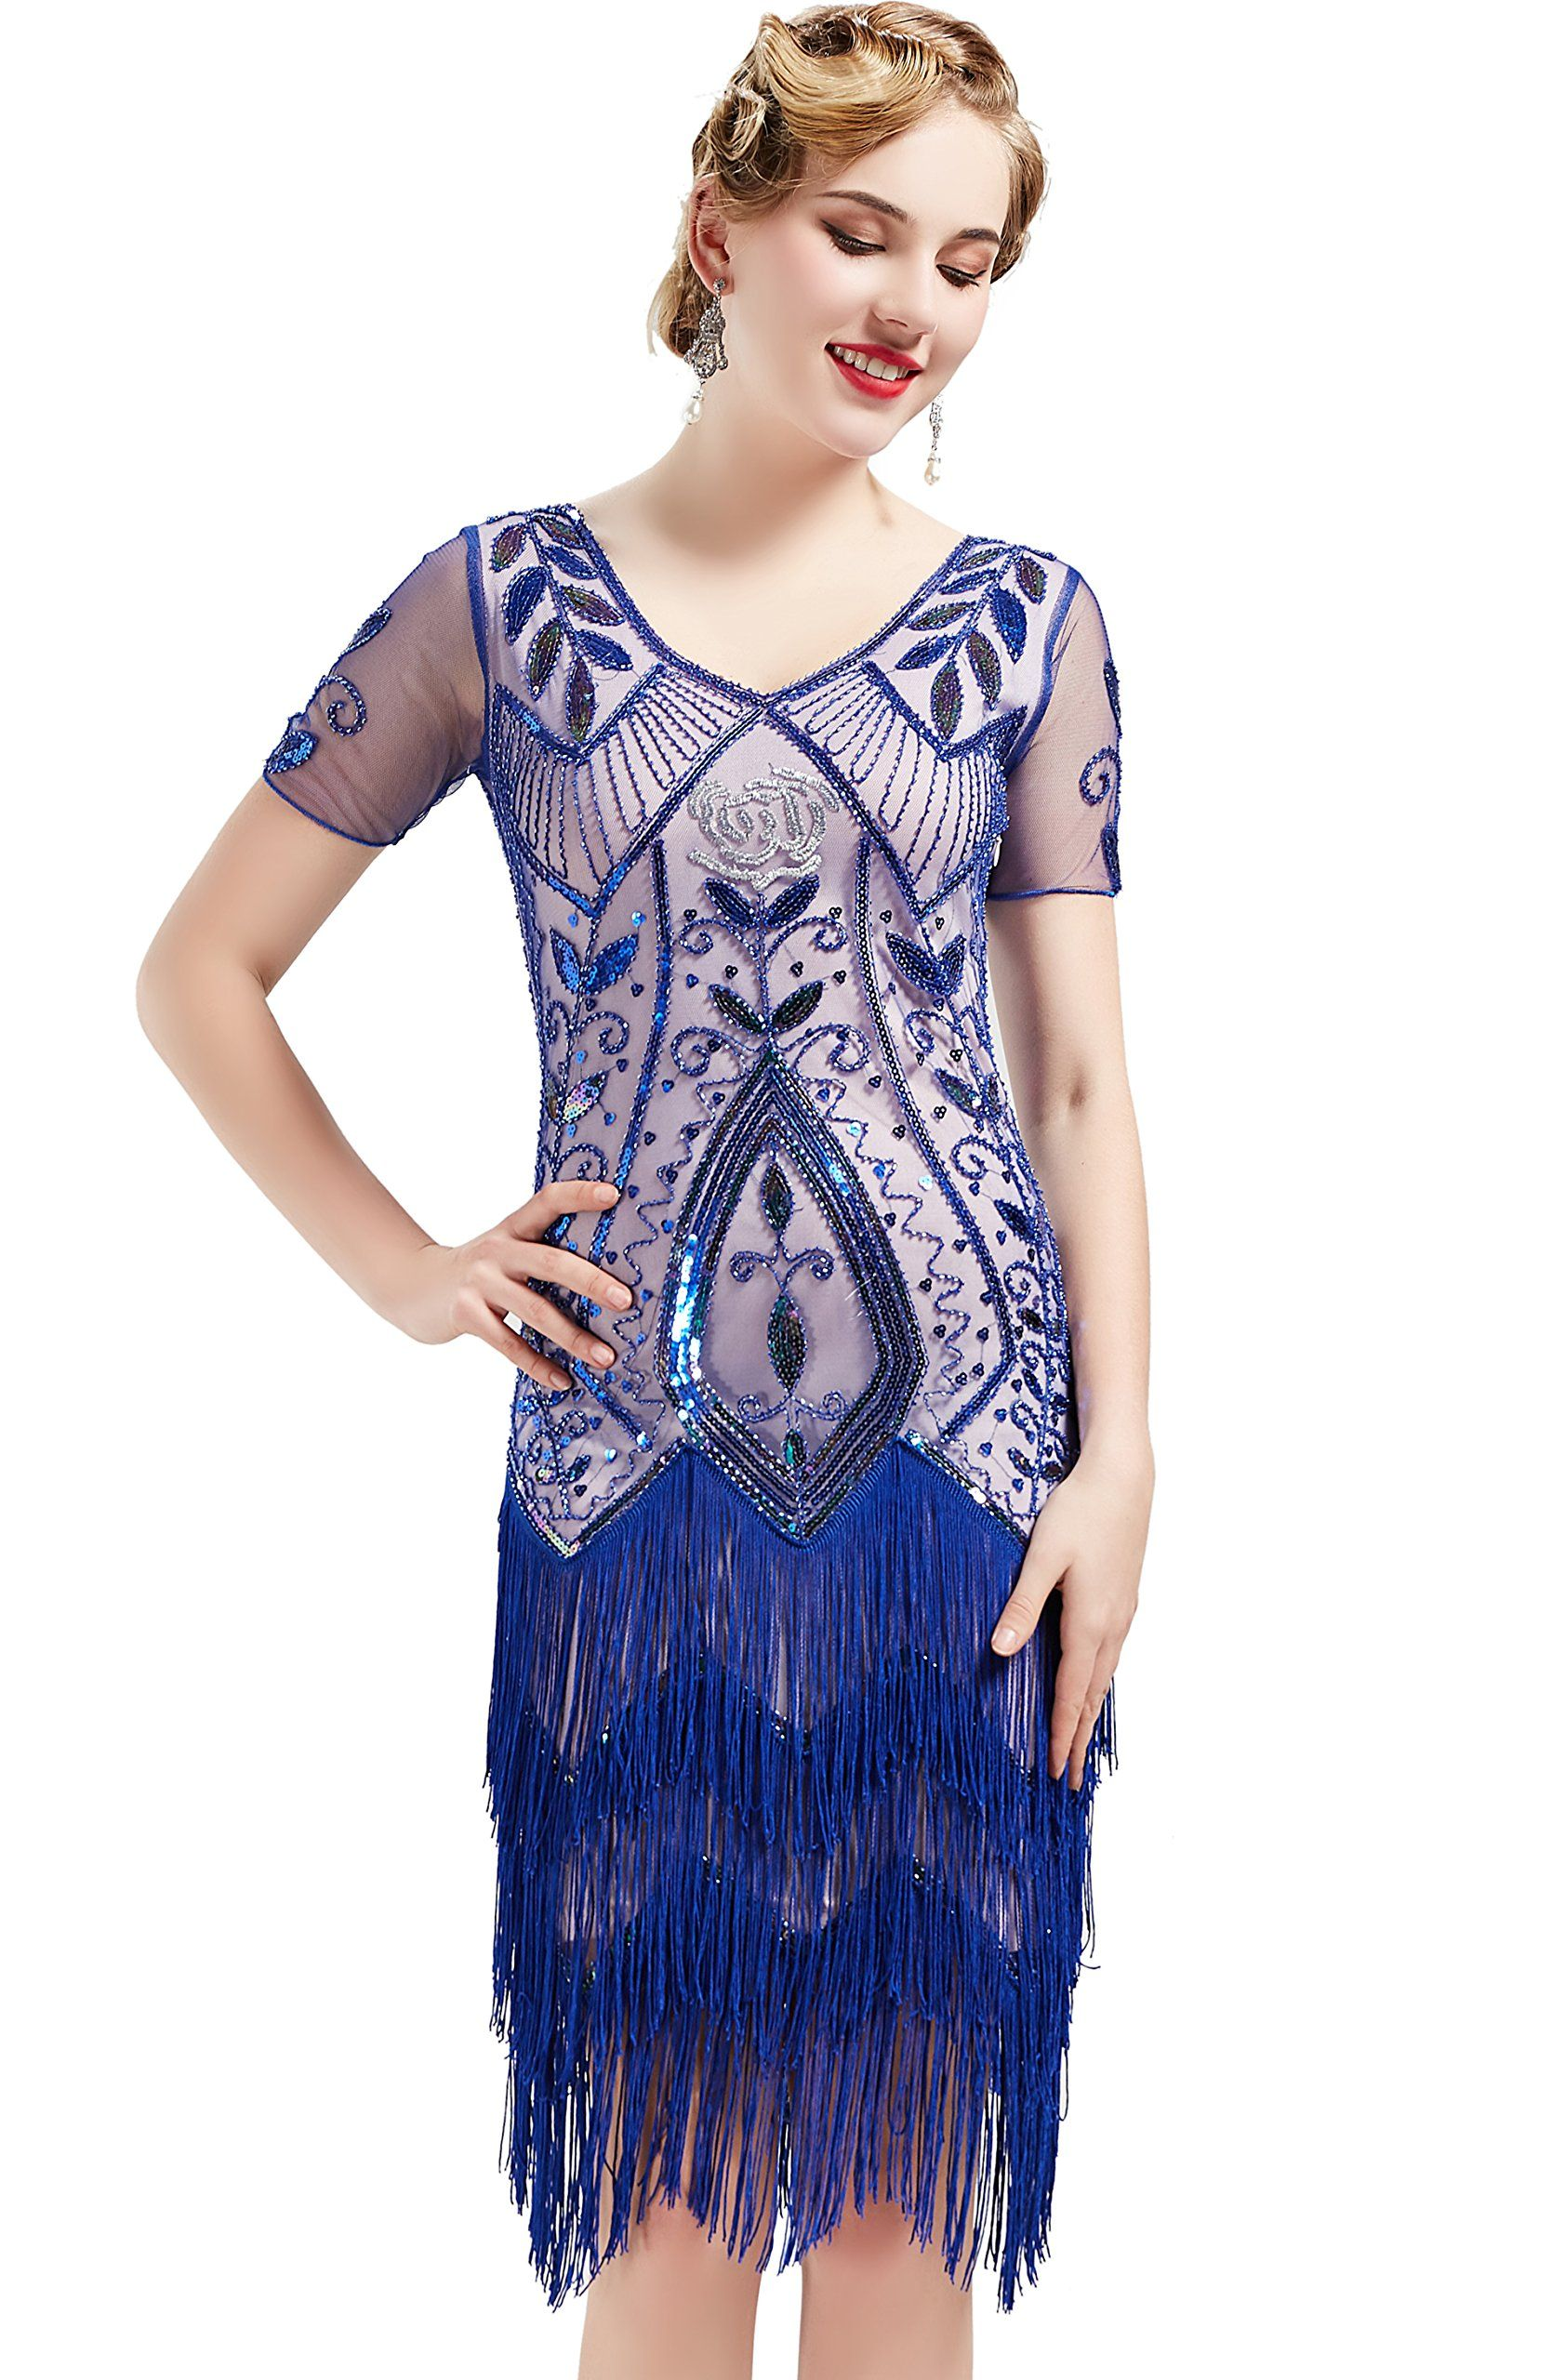 79723bf5c6 BABEYOND 1920s Art Deco Fringed Flapper Dress Roaring 20s Sequin Dress  Vintage Beaded Gatsby Costume Dress